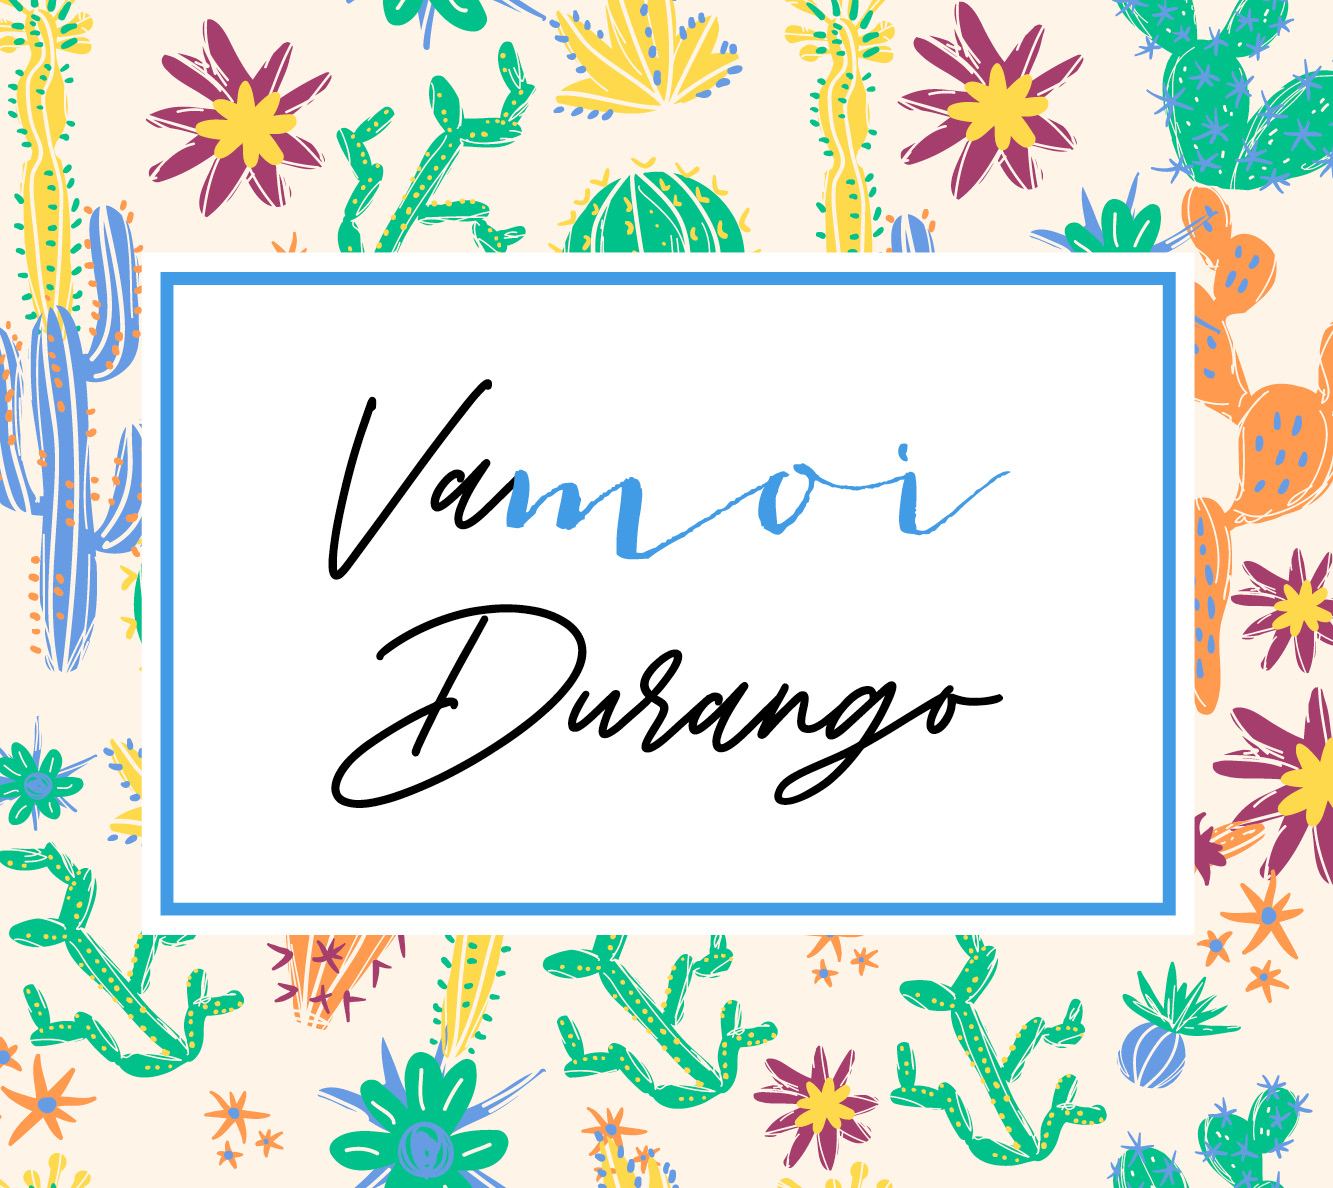 Vamoi Durango